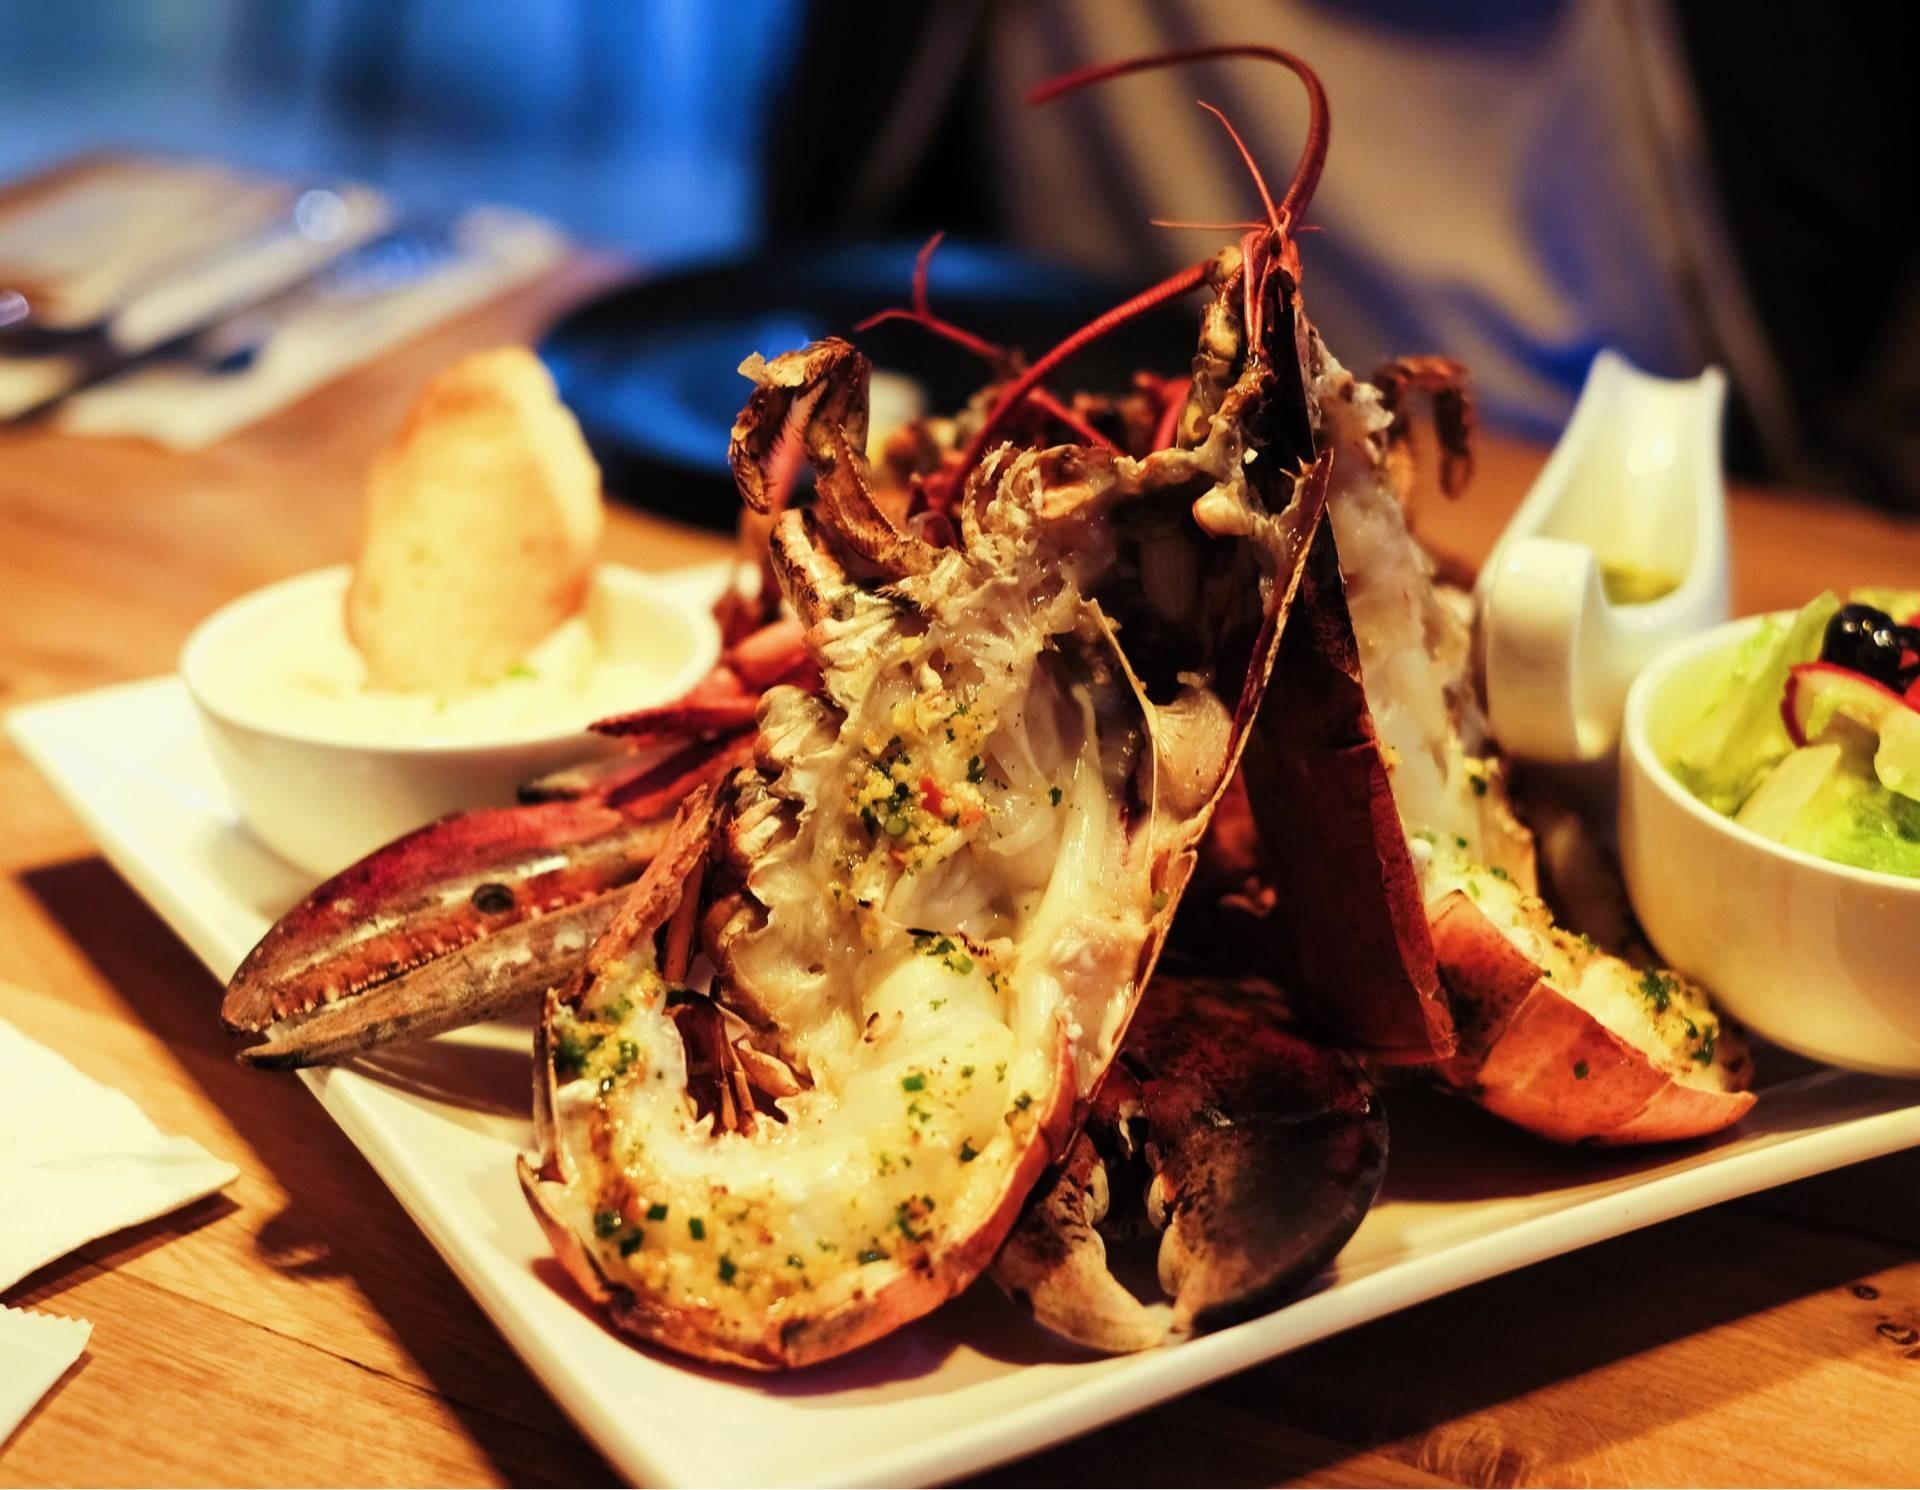 Marian by Lobster and Oyster ทองหล่อ 13 ทองหล่อ 13